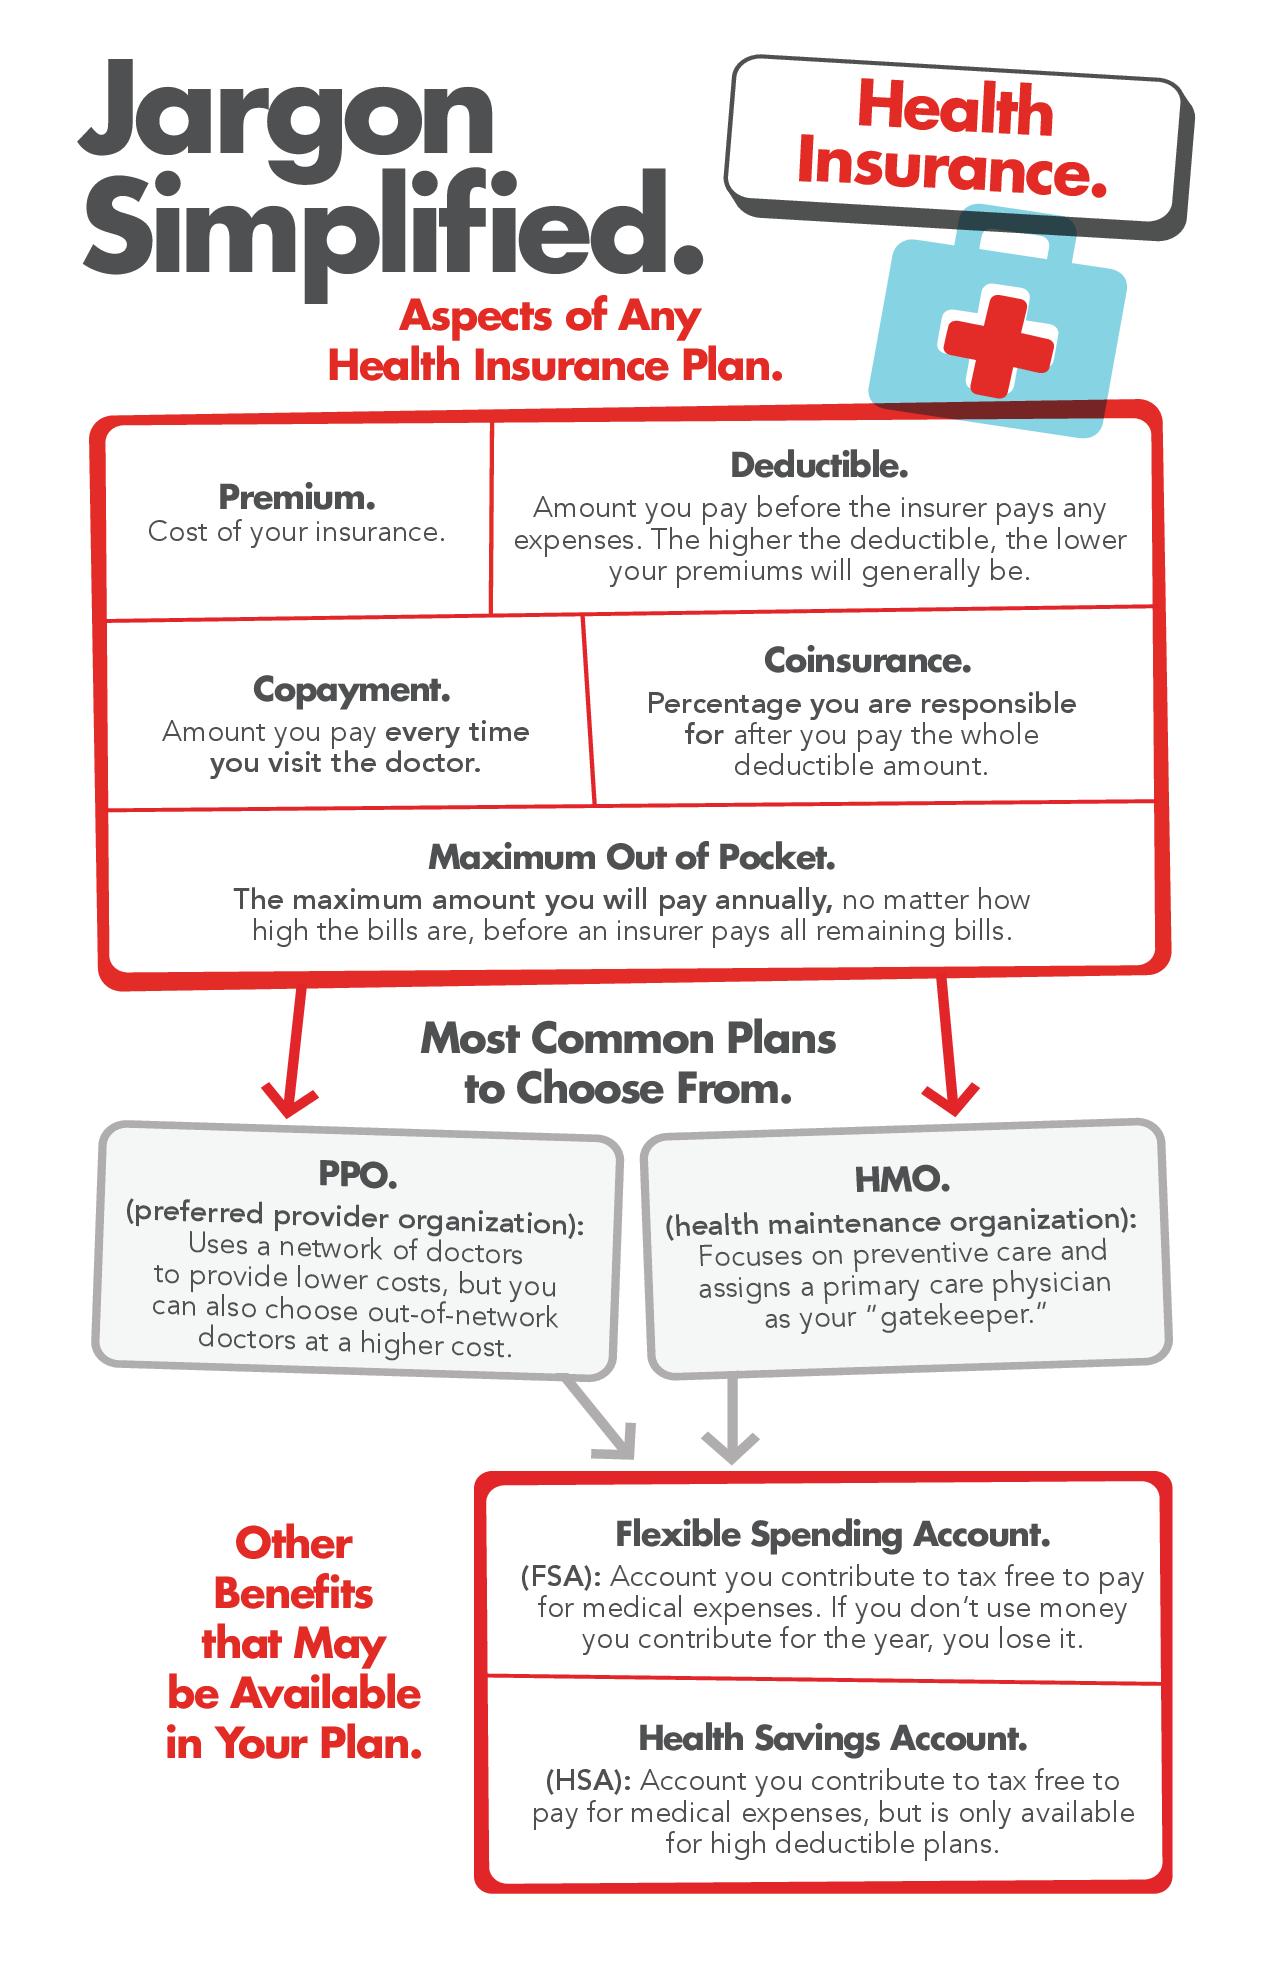 Jargon Simplified: Health Insurance